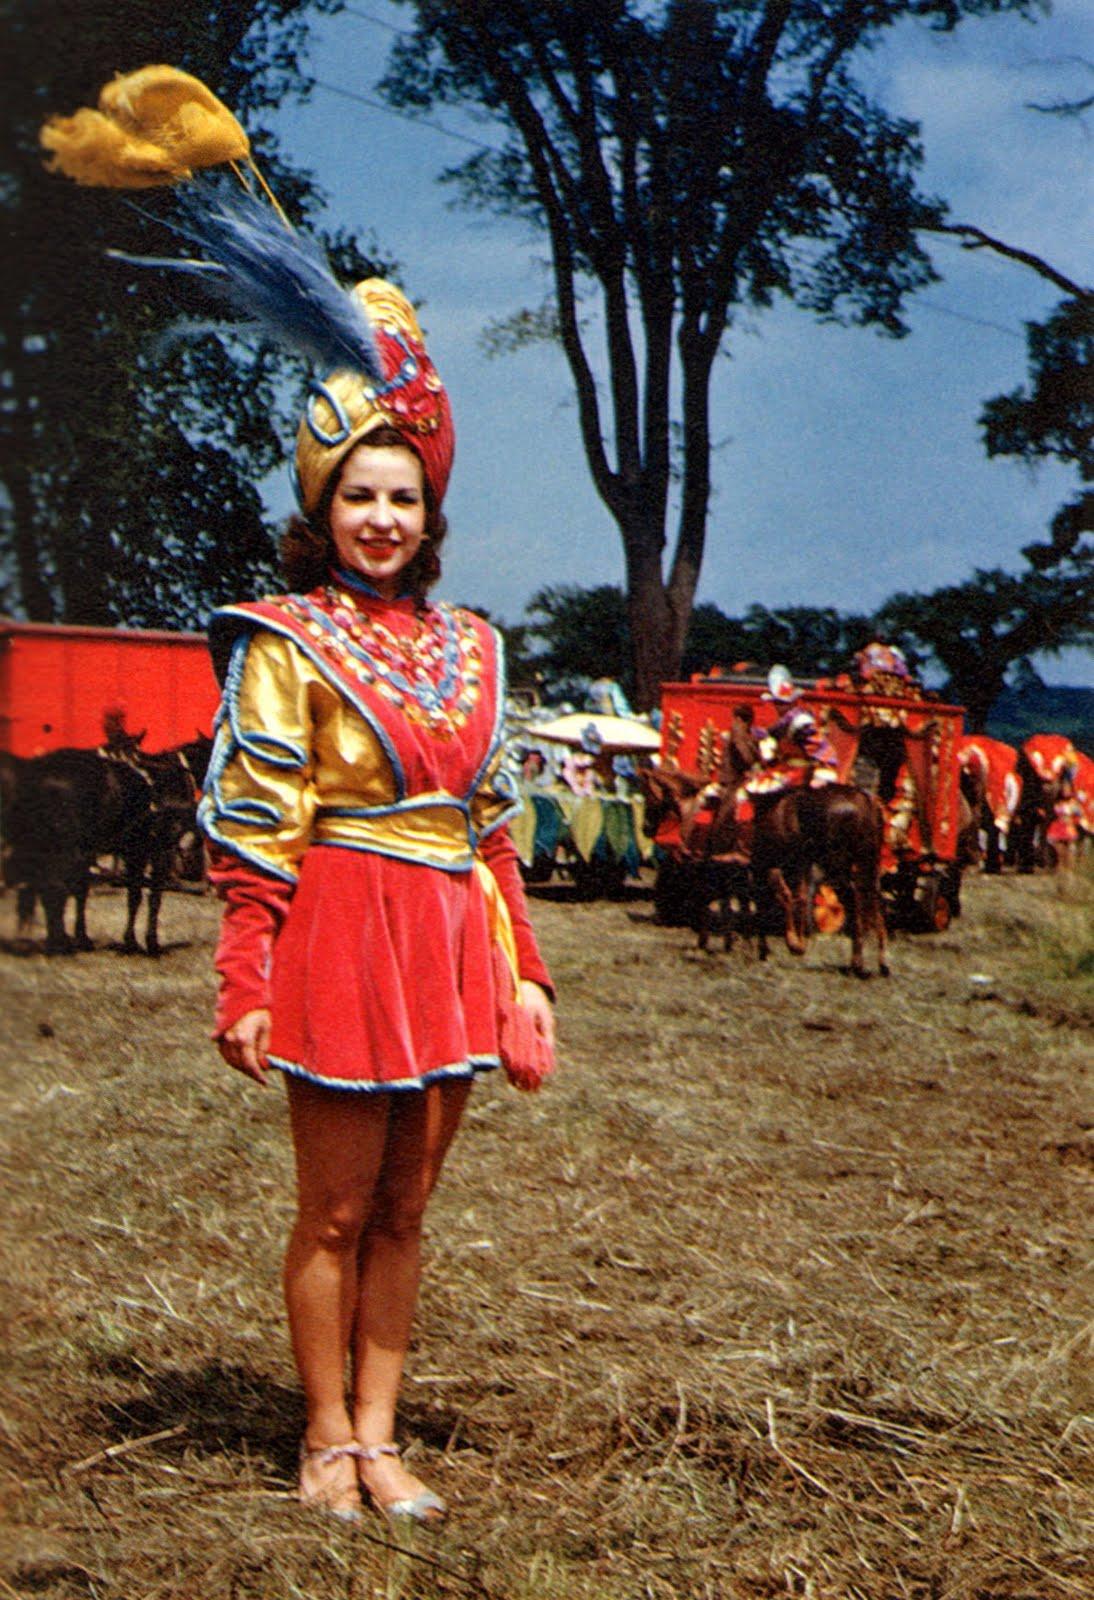 showgirl-ringling-bros-circus-girl-1945